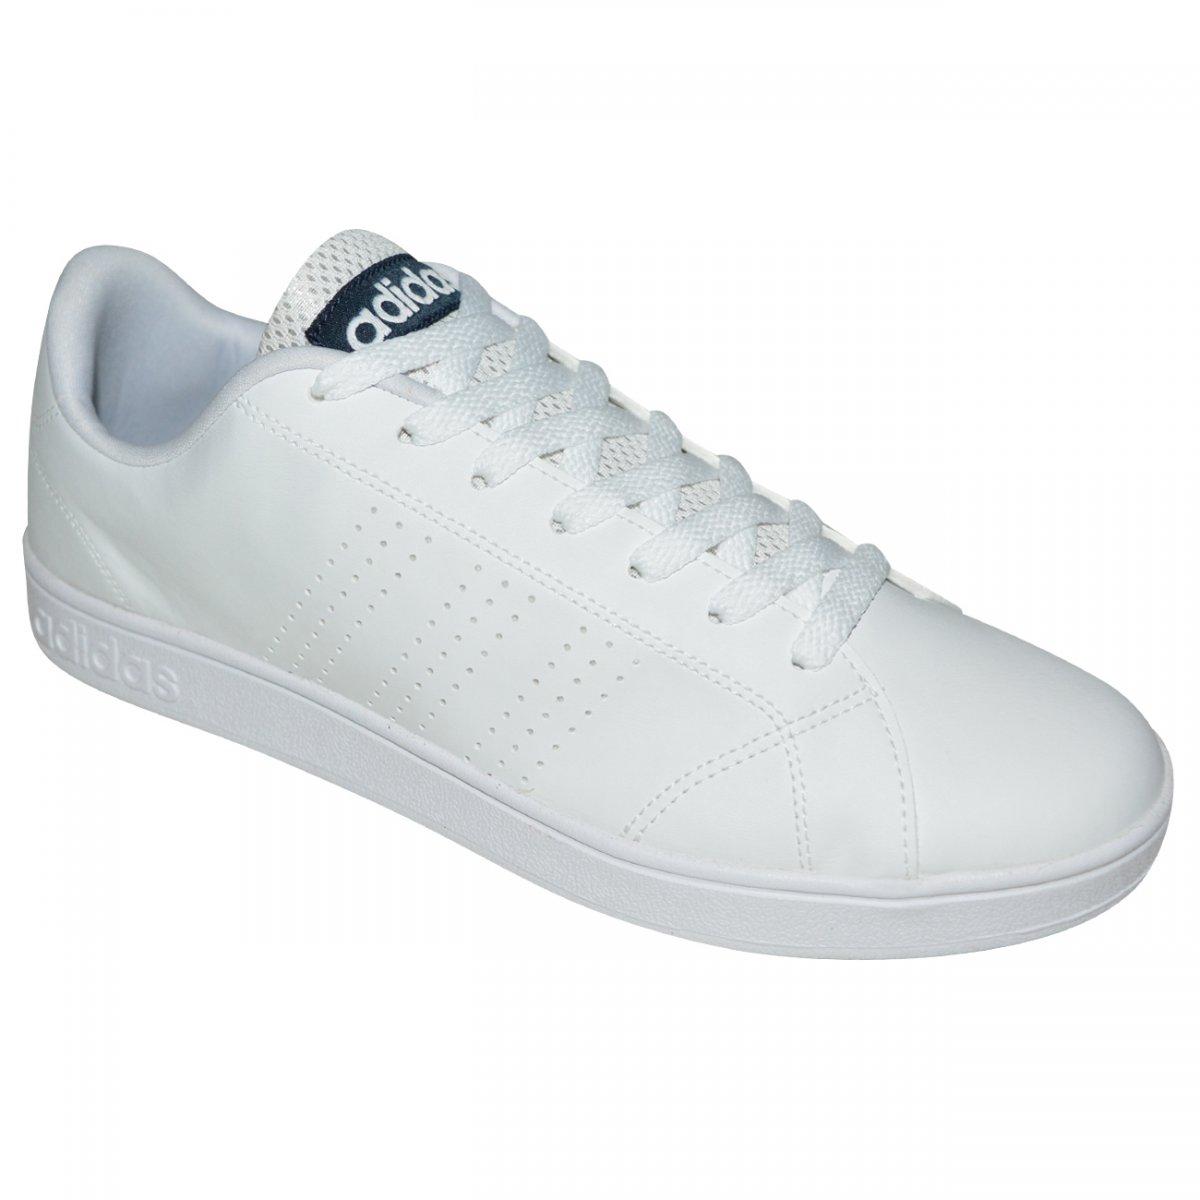 ... Tenis Adidas Advantage Clean F99252 - Branco branco marinho - Chuteira  Nike 55ed8471b41ee